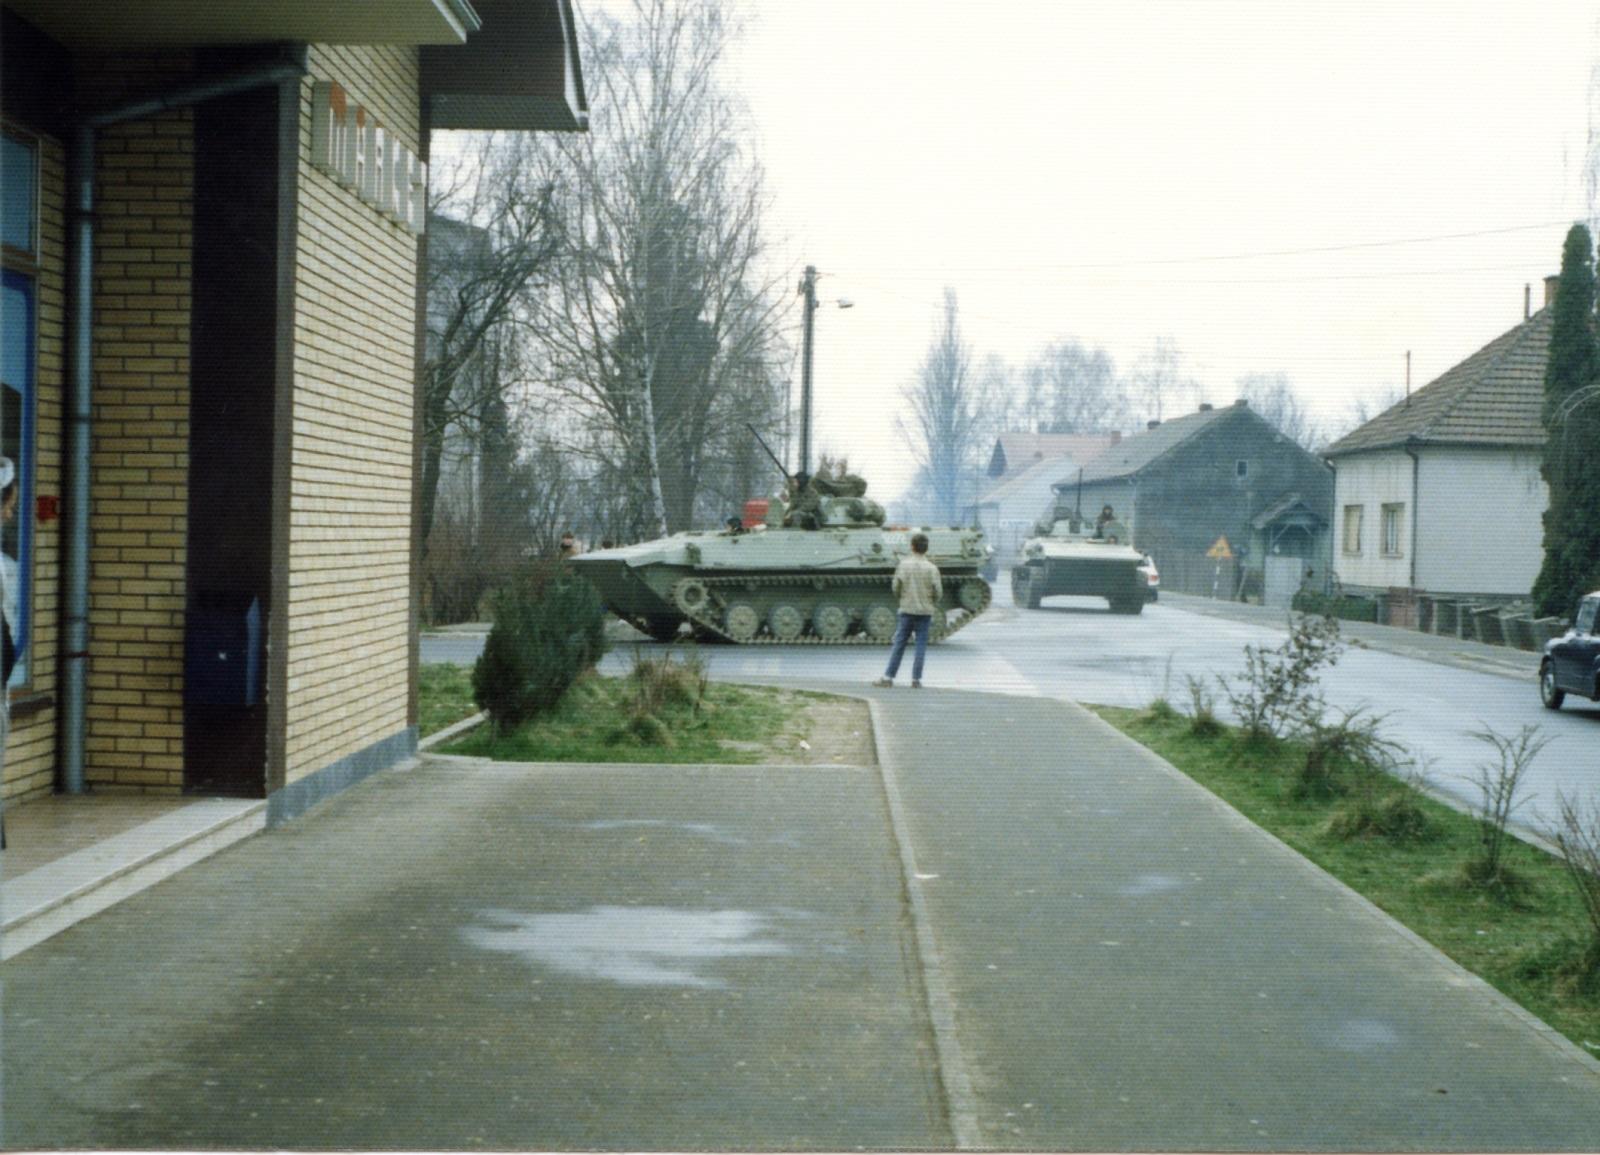 Tenkovi_na_pakrackim_ulicama_-_AGS